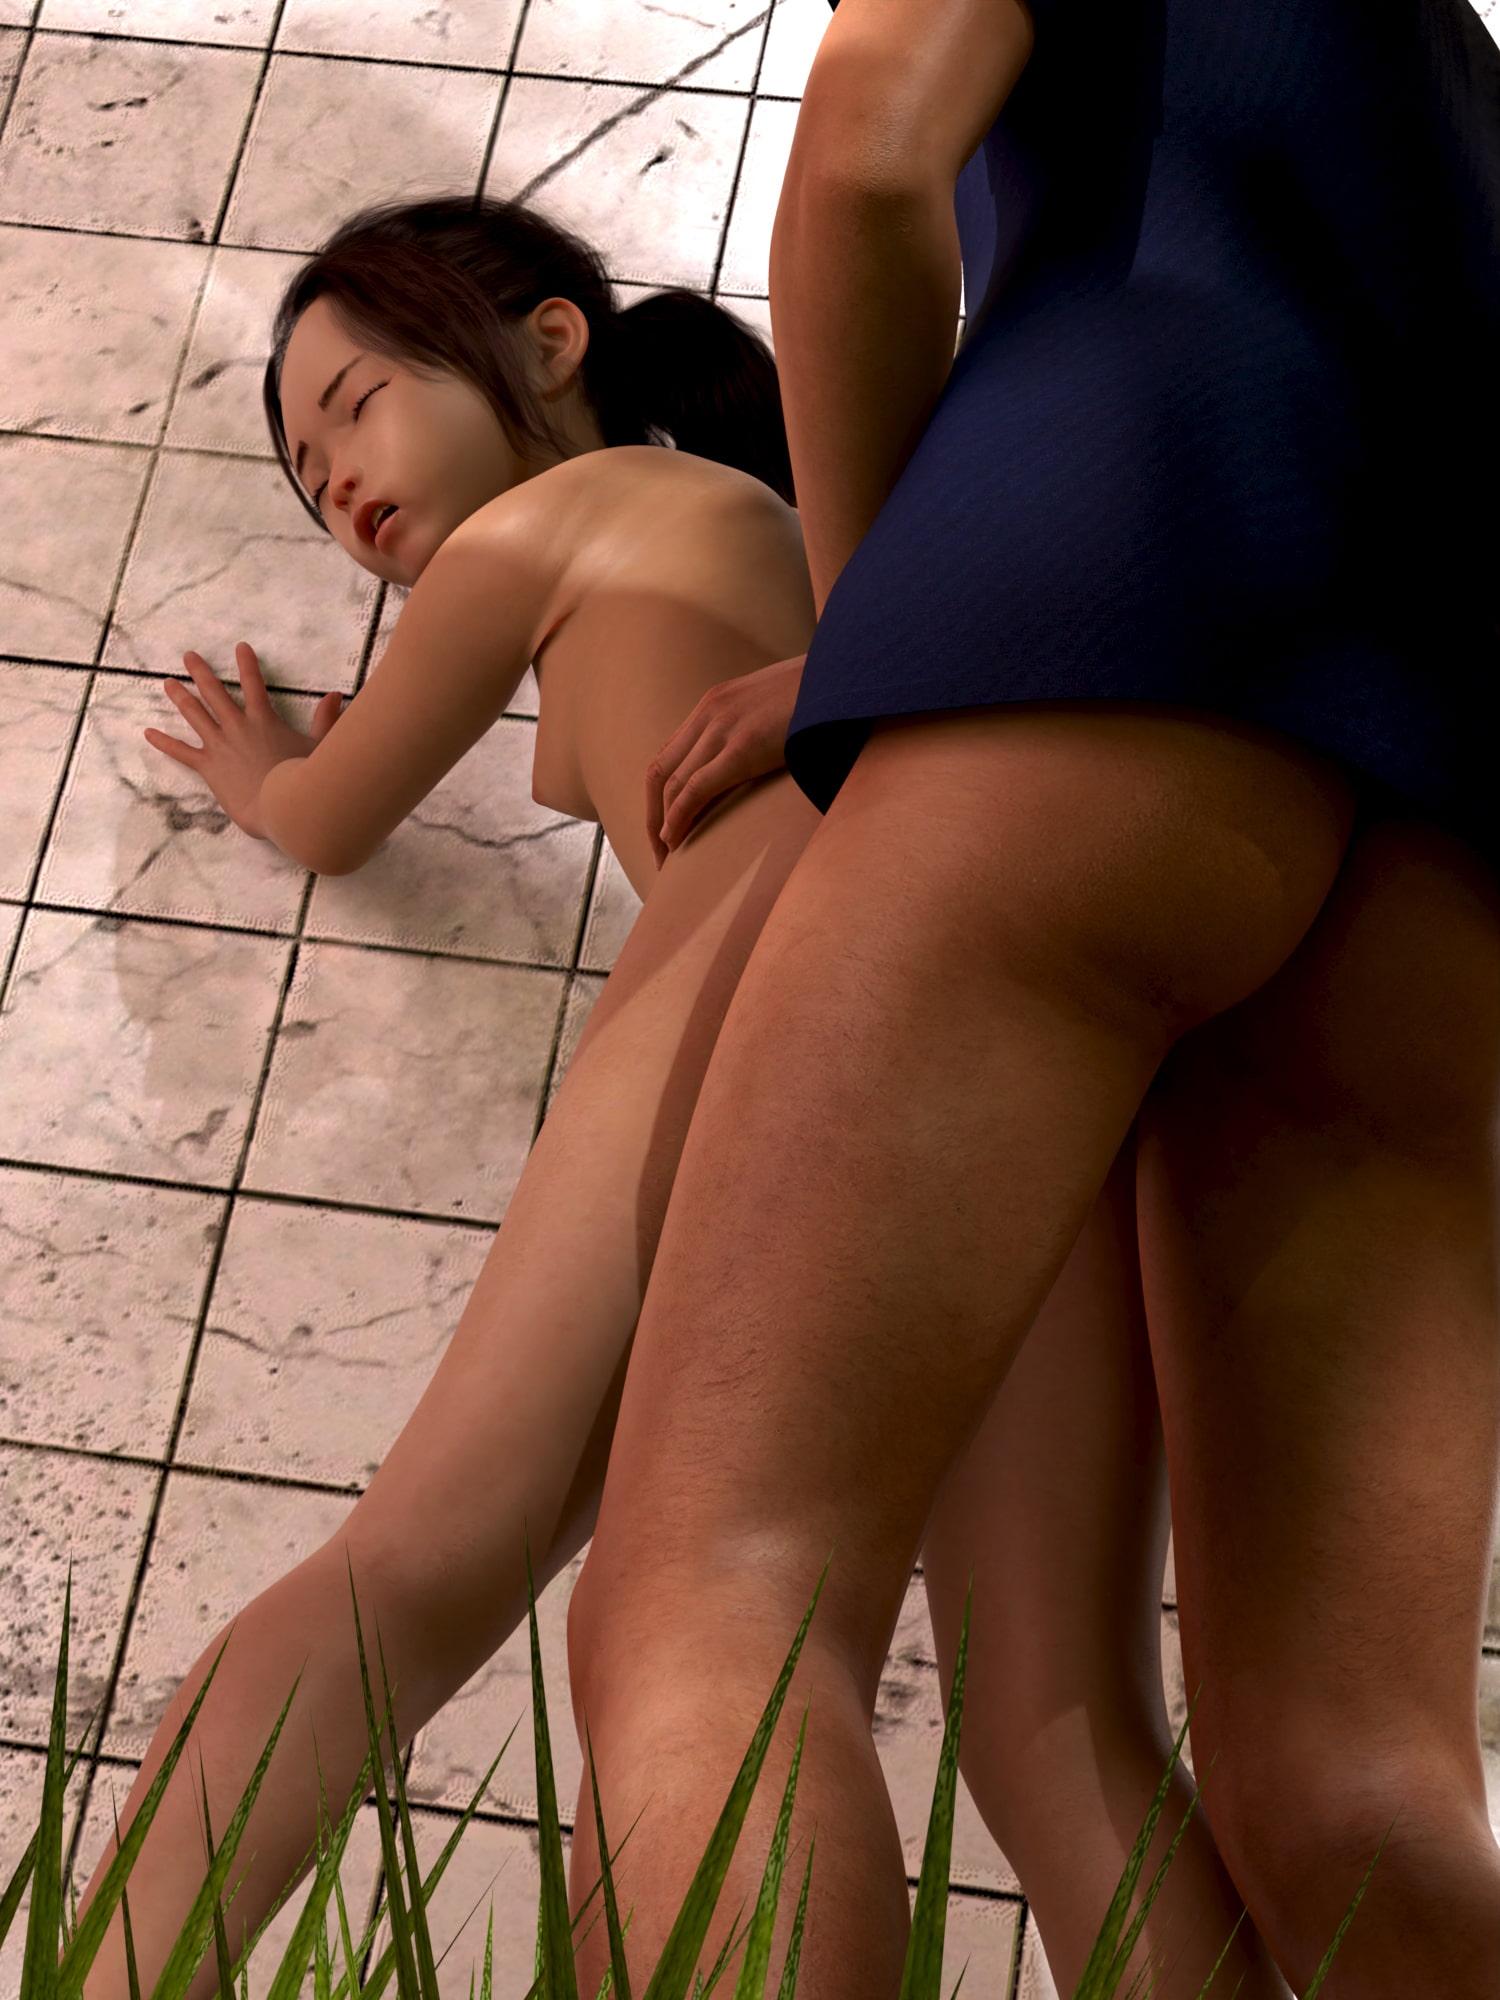 RJ318636 Japanese Cutie 〜露出癖が同級生にバレて人生詰んだ女子〜 [20210223]